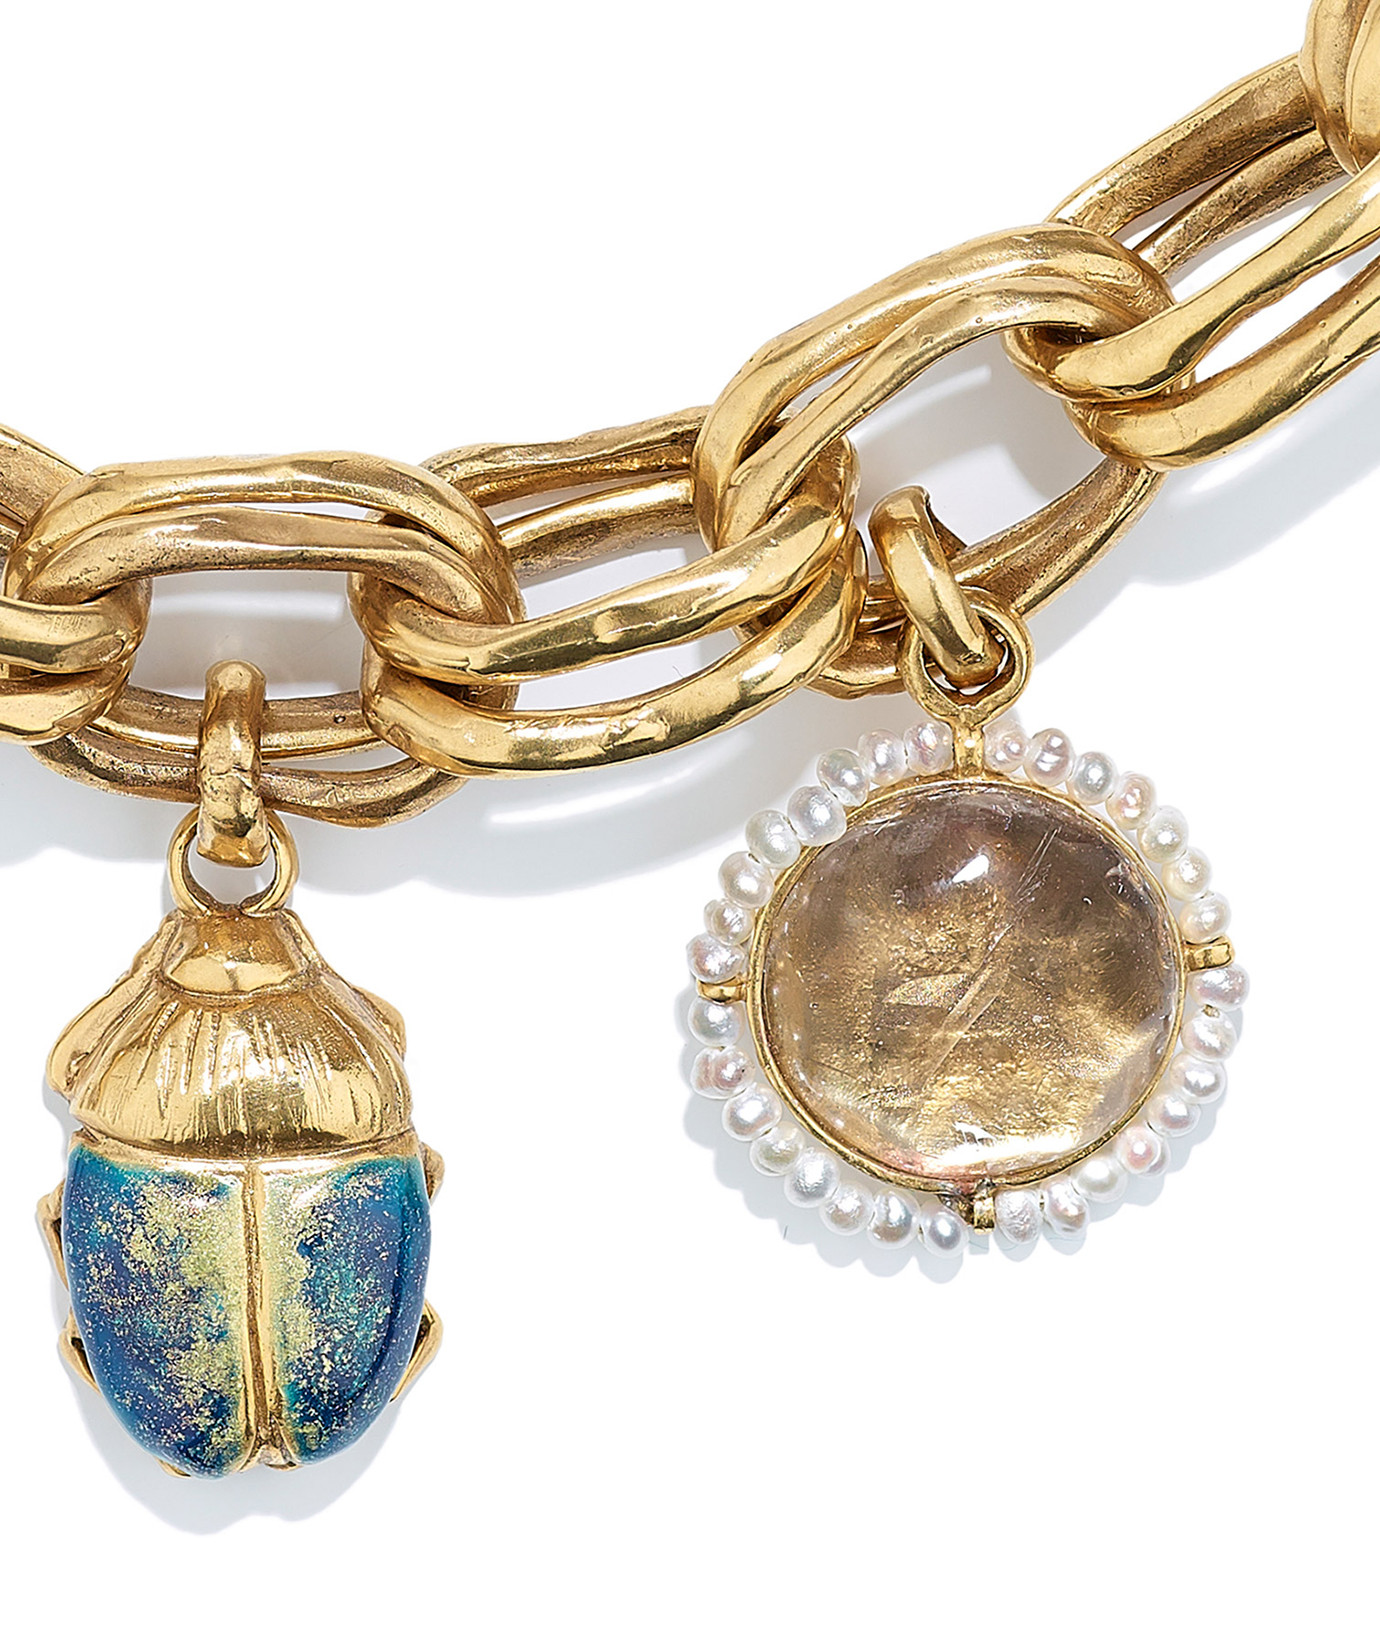 GOOSSENS - Bracelet Talisman Cristal de Roche Naturel